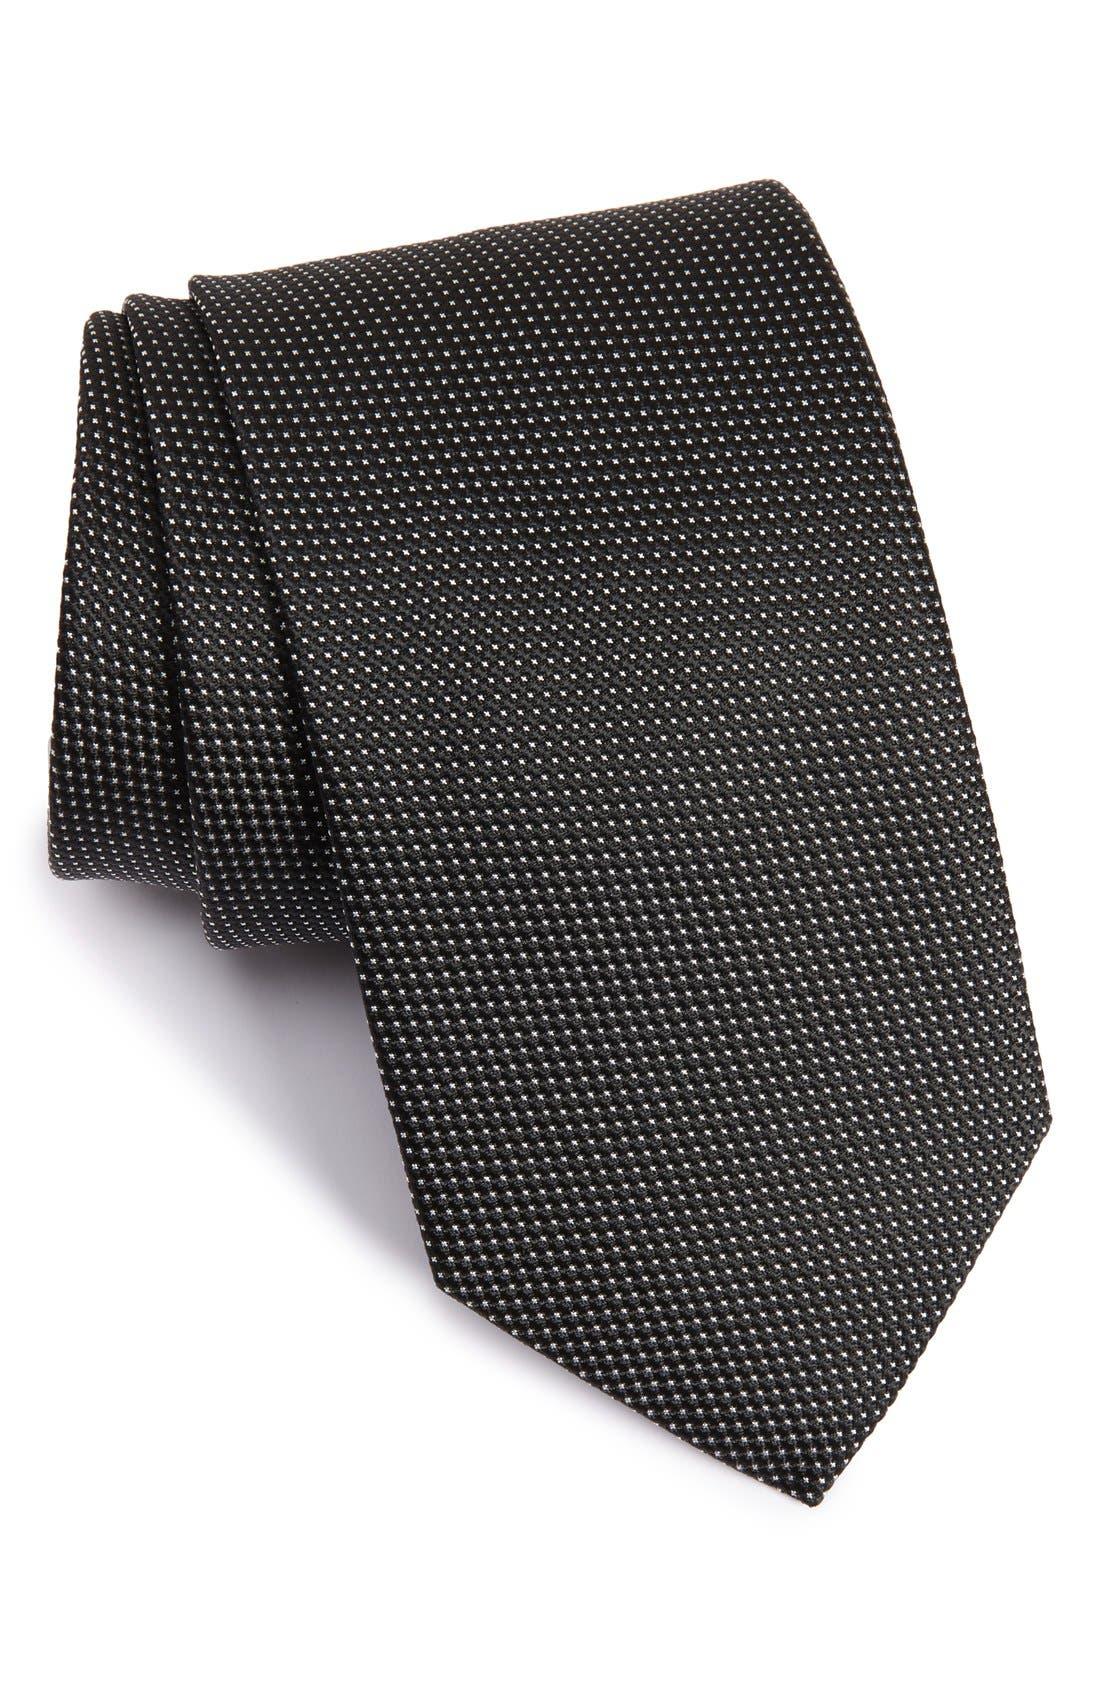 Microdot Silk Tie,                             Main thumbnail 1, color,                             BLACK